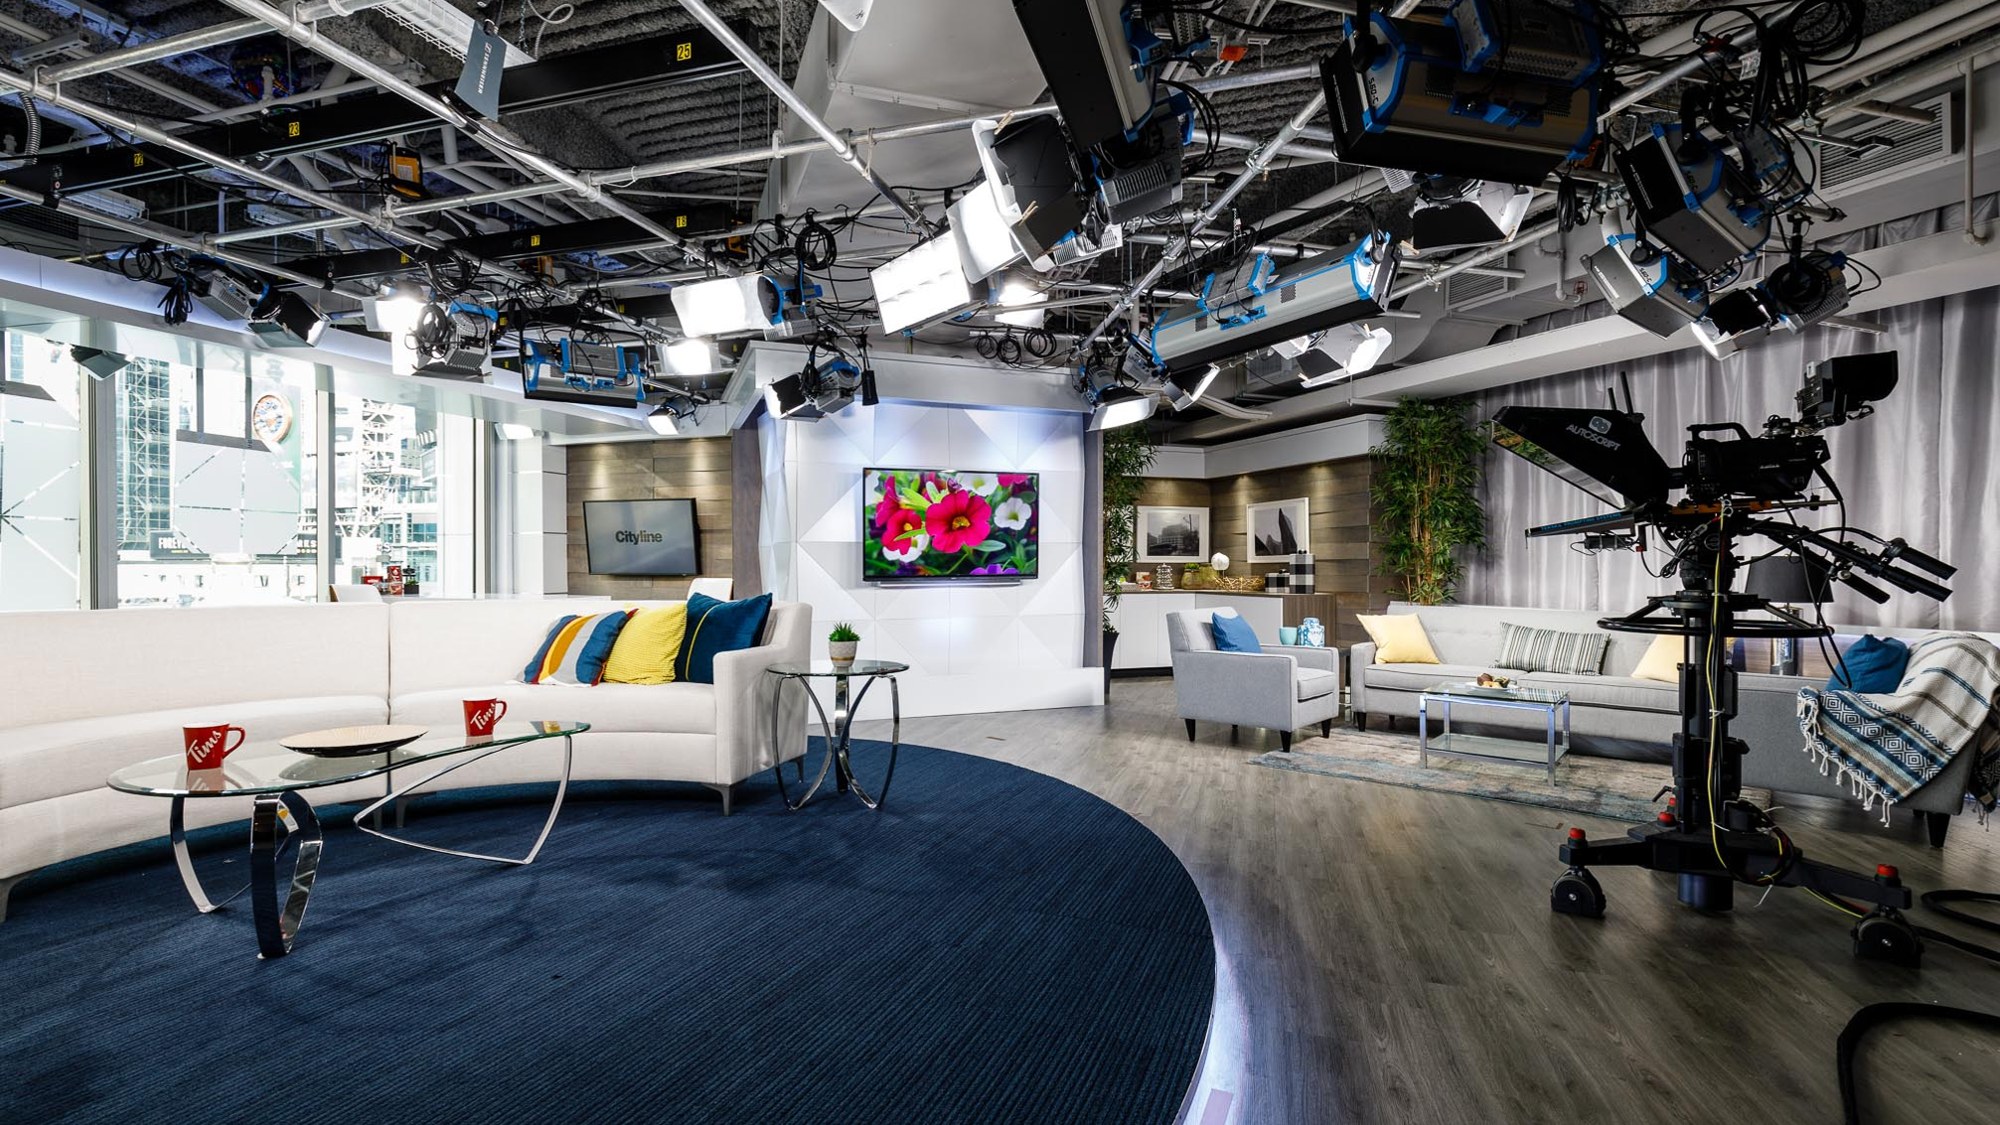 ncs_bt-breakfast-television-canada-tv-studio_0006